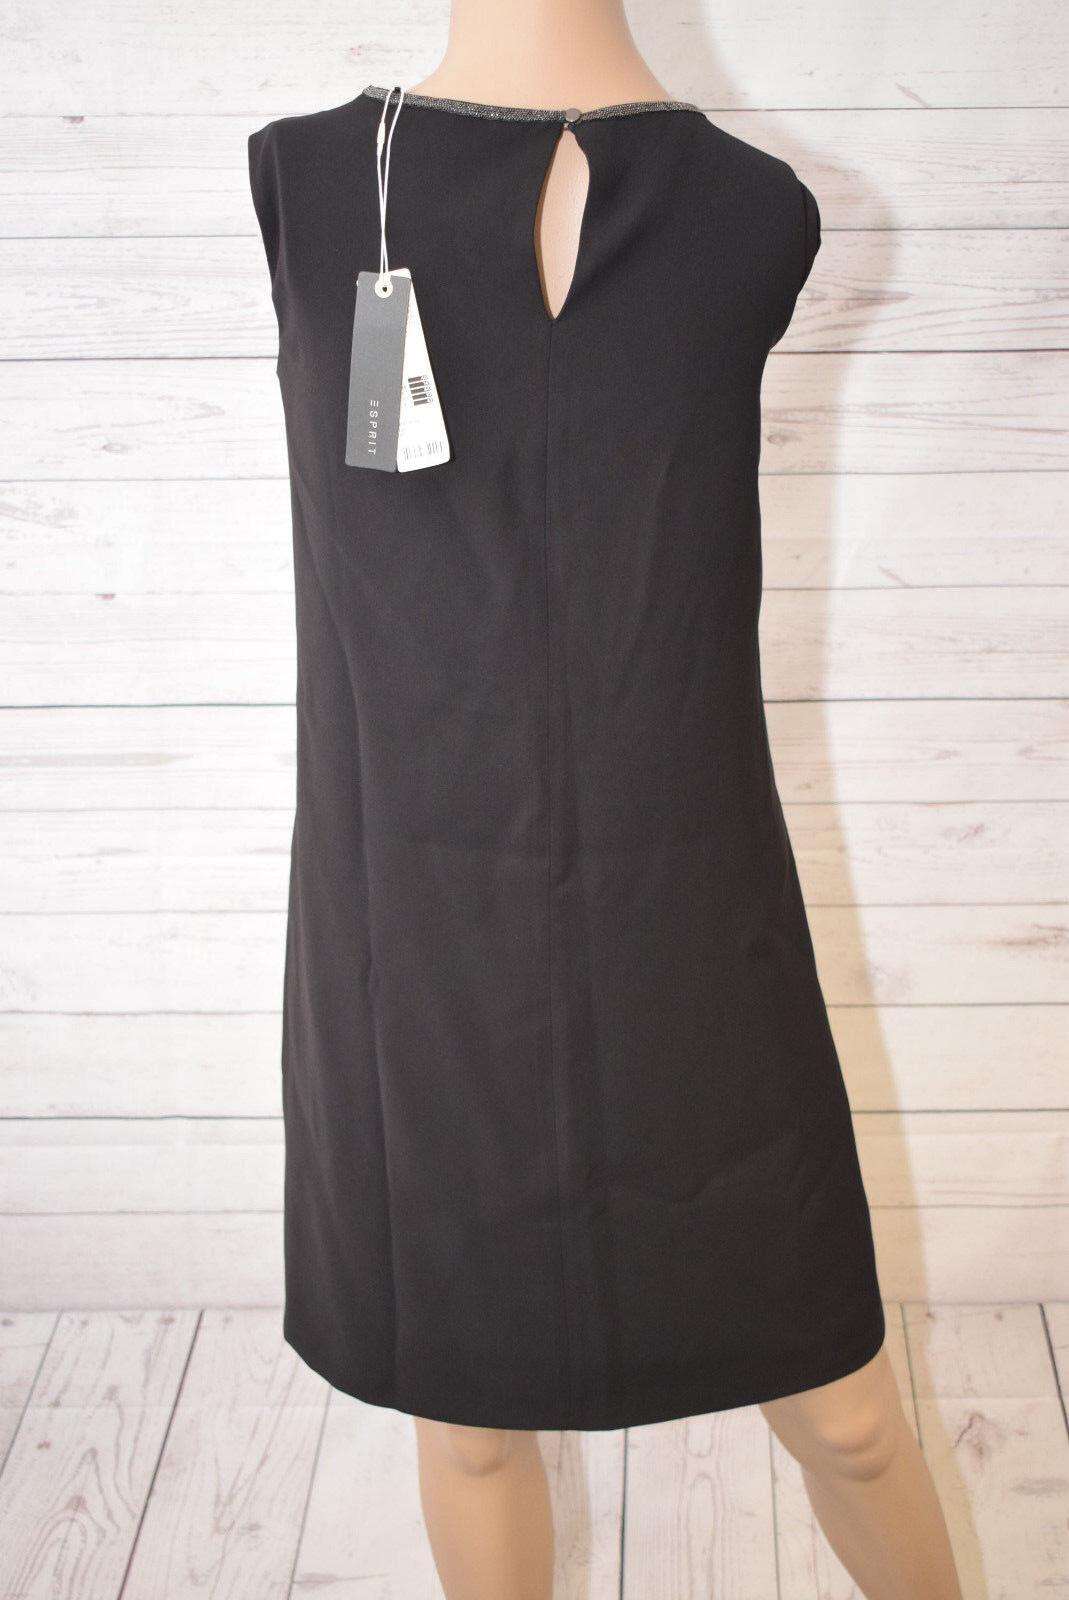 ESPRIT Collection Damen Etui Etui Etui Kleid schwarz Gr. 40 2f76d9